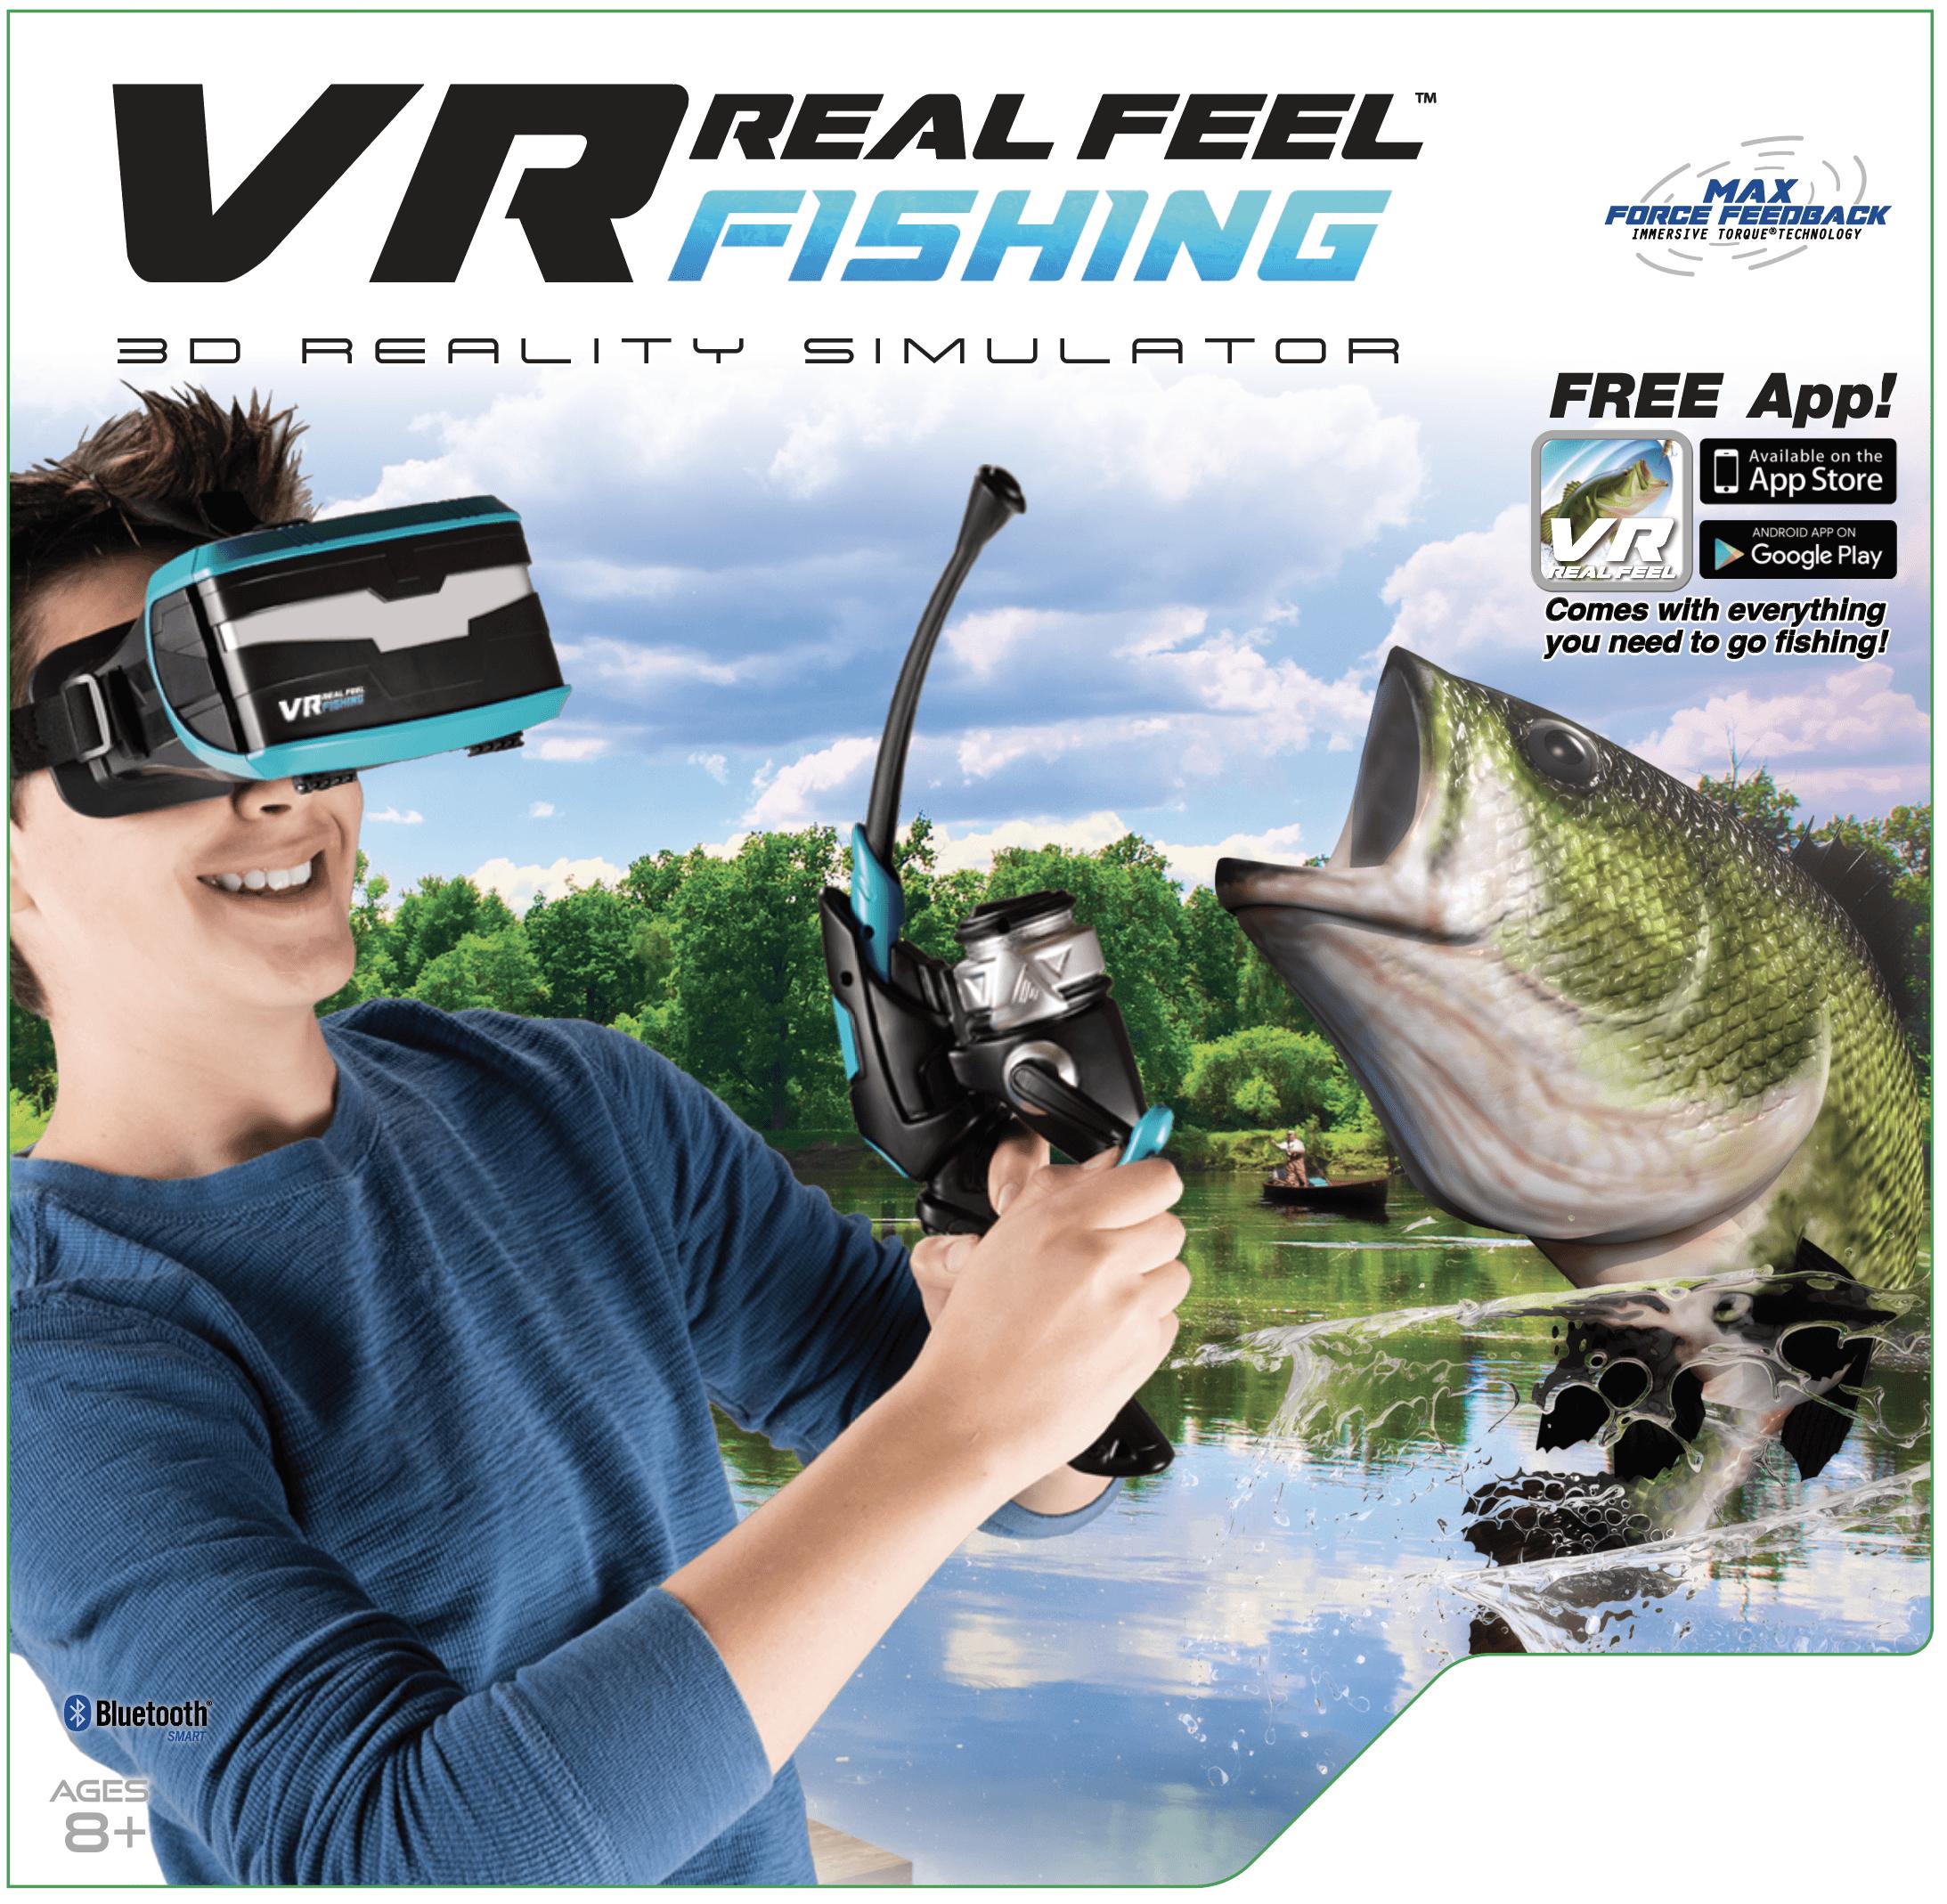 VR Real Feel Fishing W/ Headset